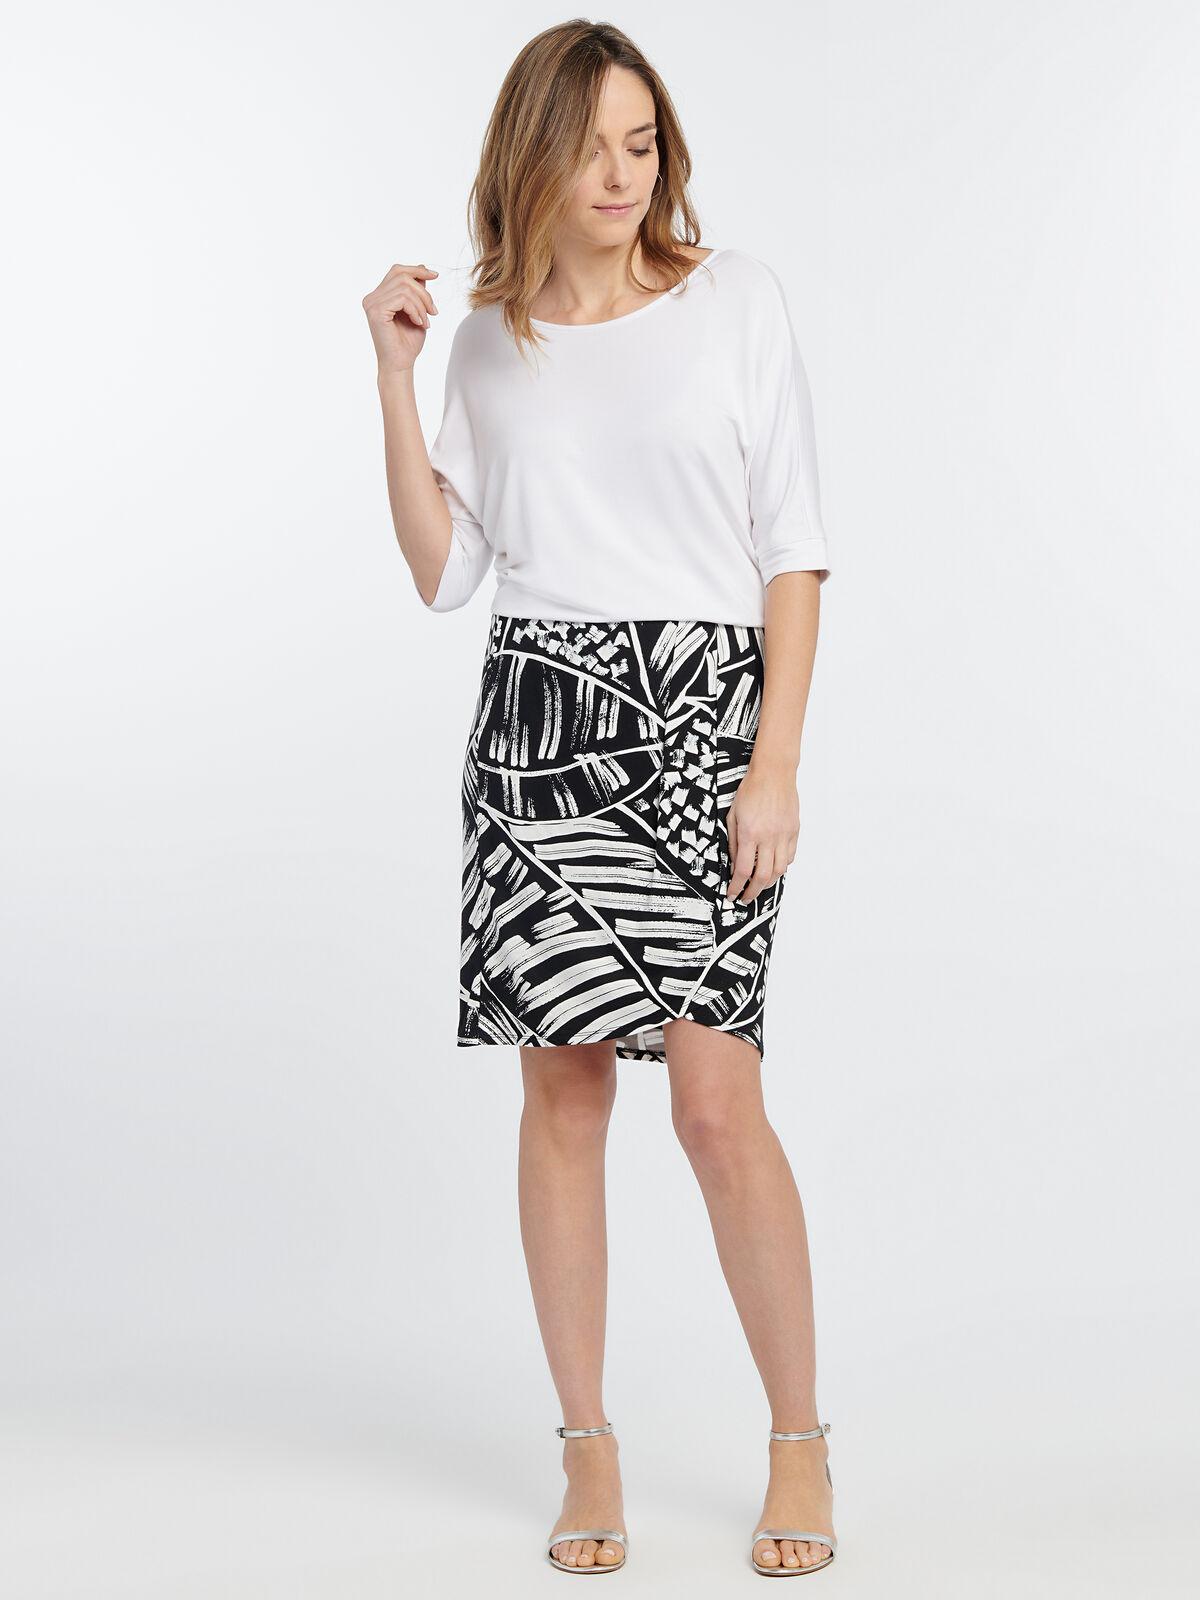 Moonlit Palm Skirt